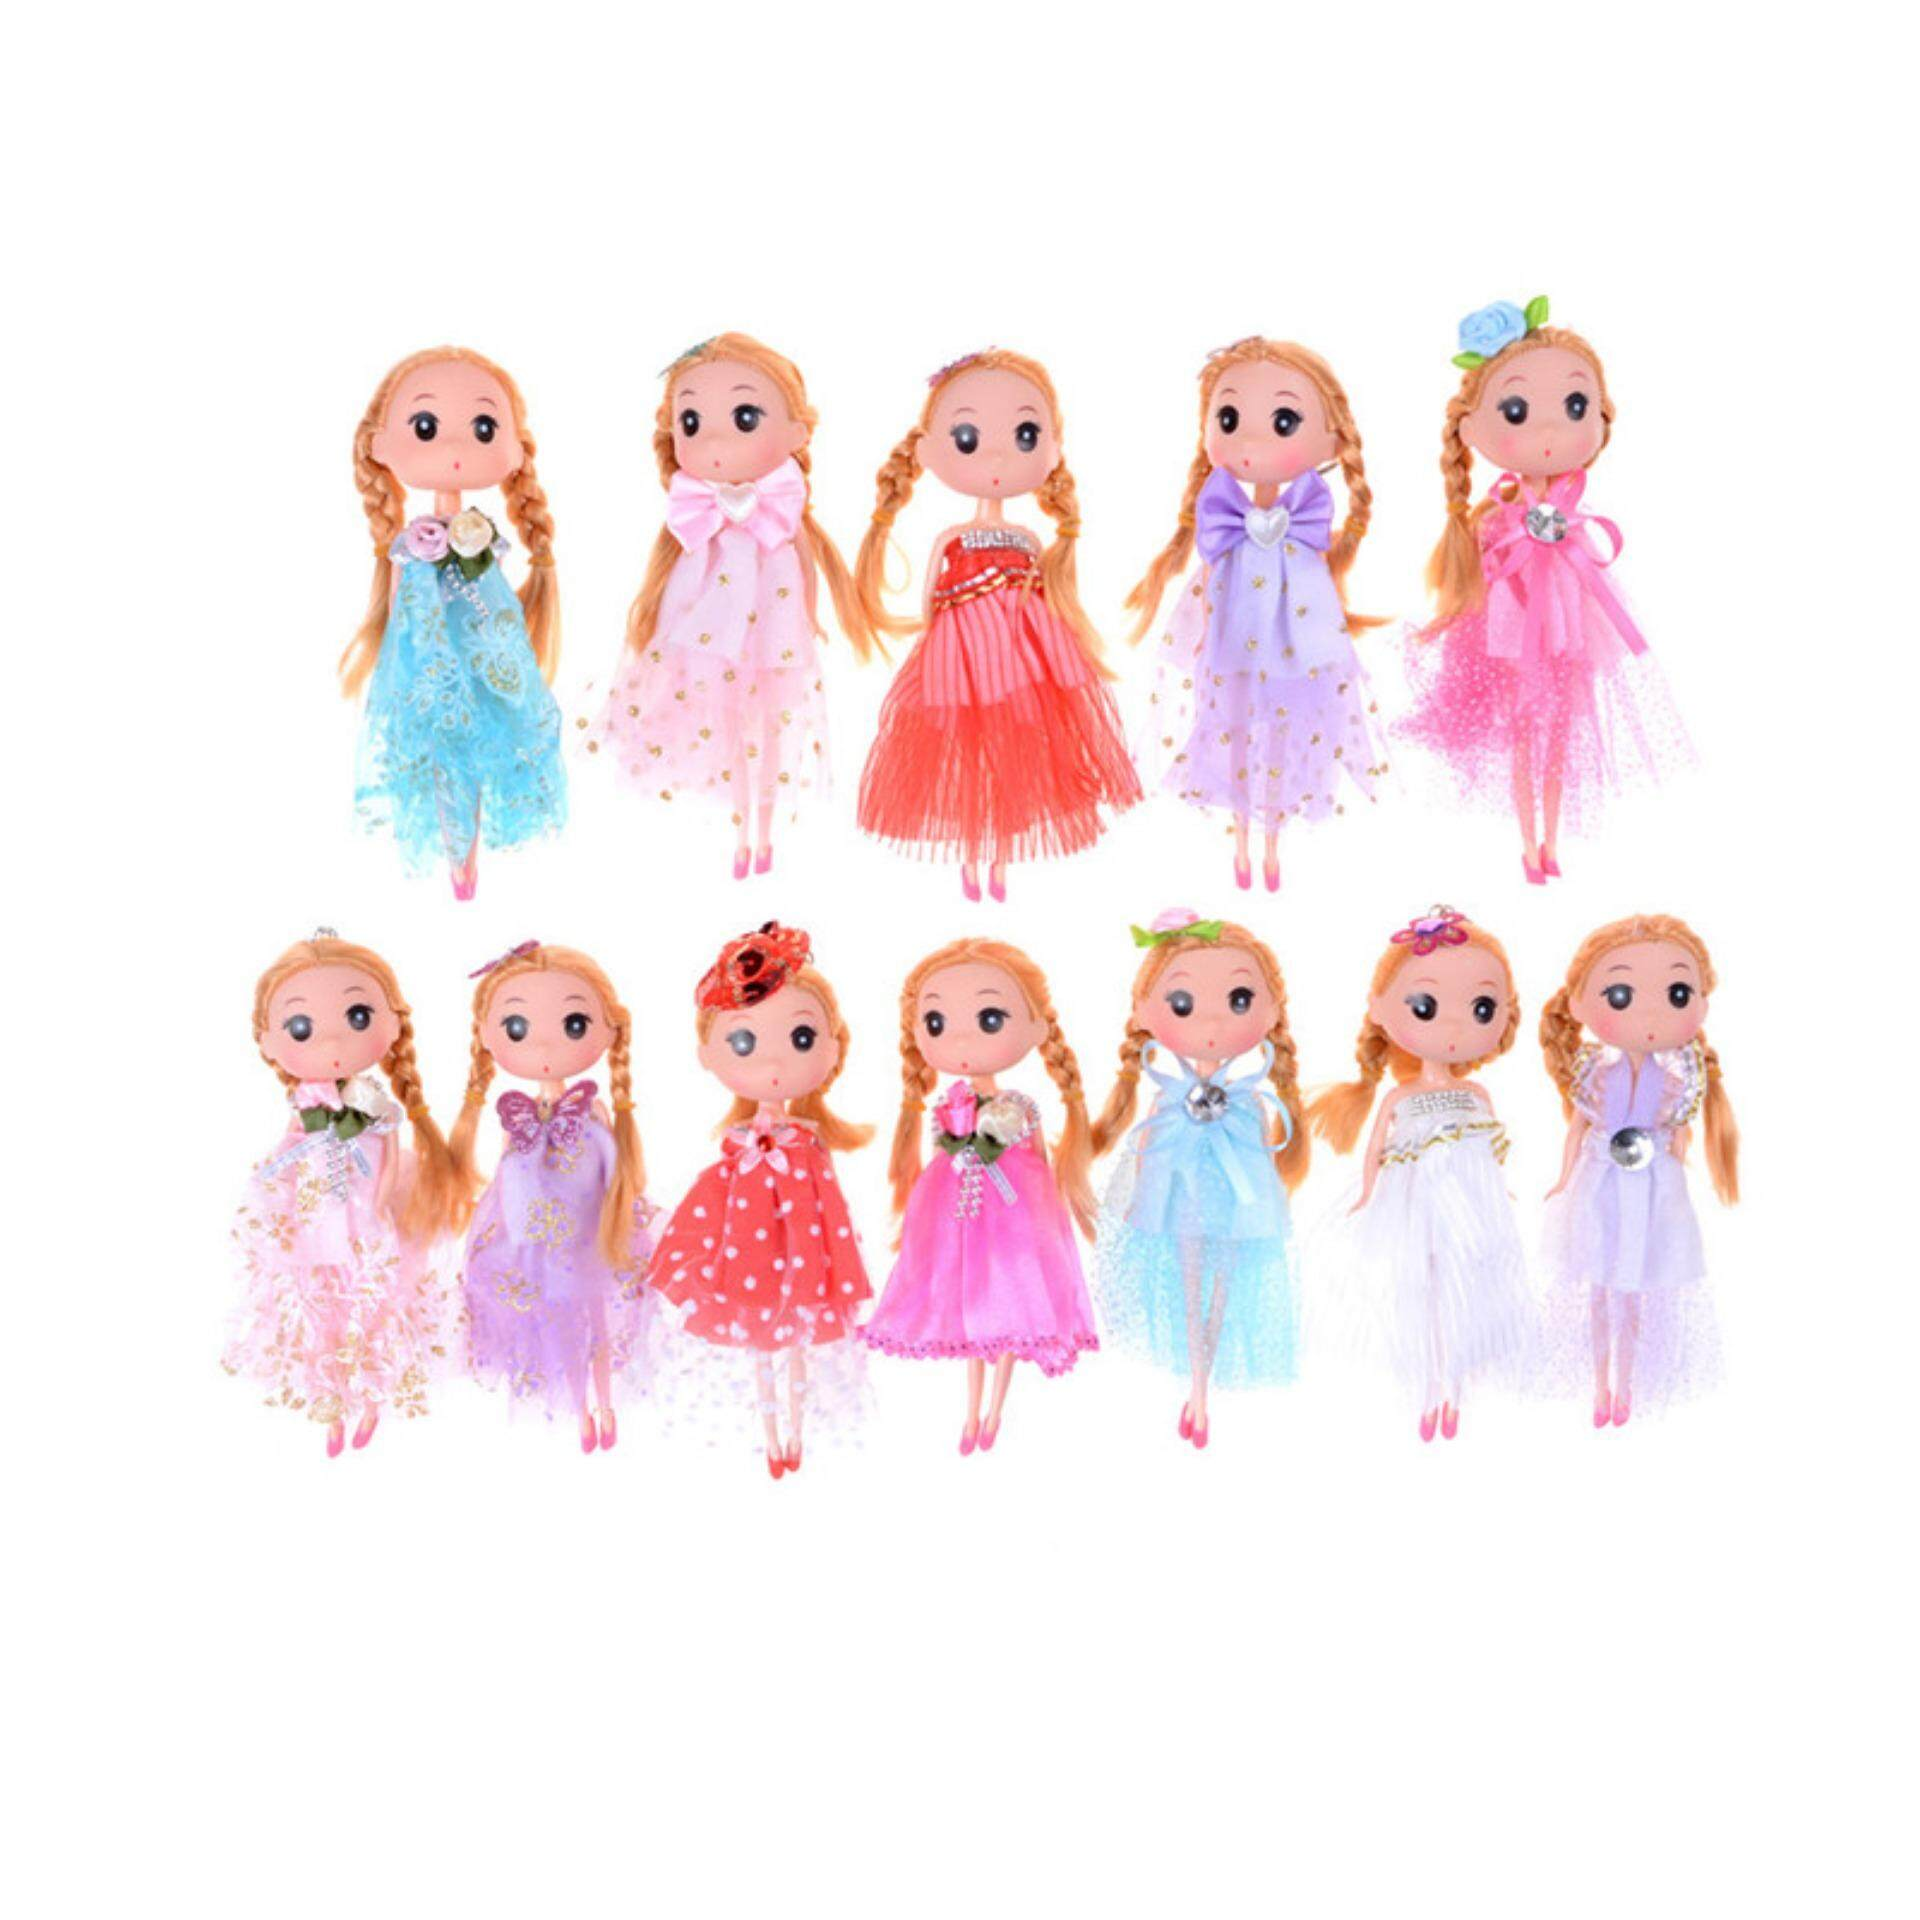 Rp 48.000 18 Cm Bingung Ddung Doll Tas ...